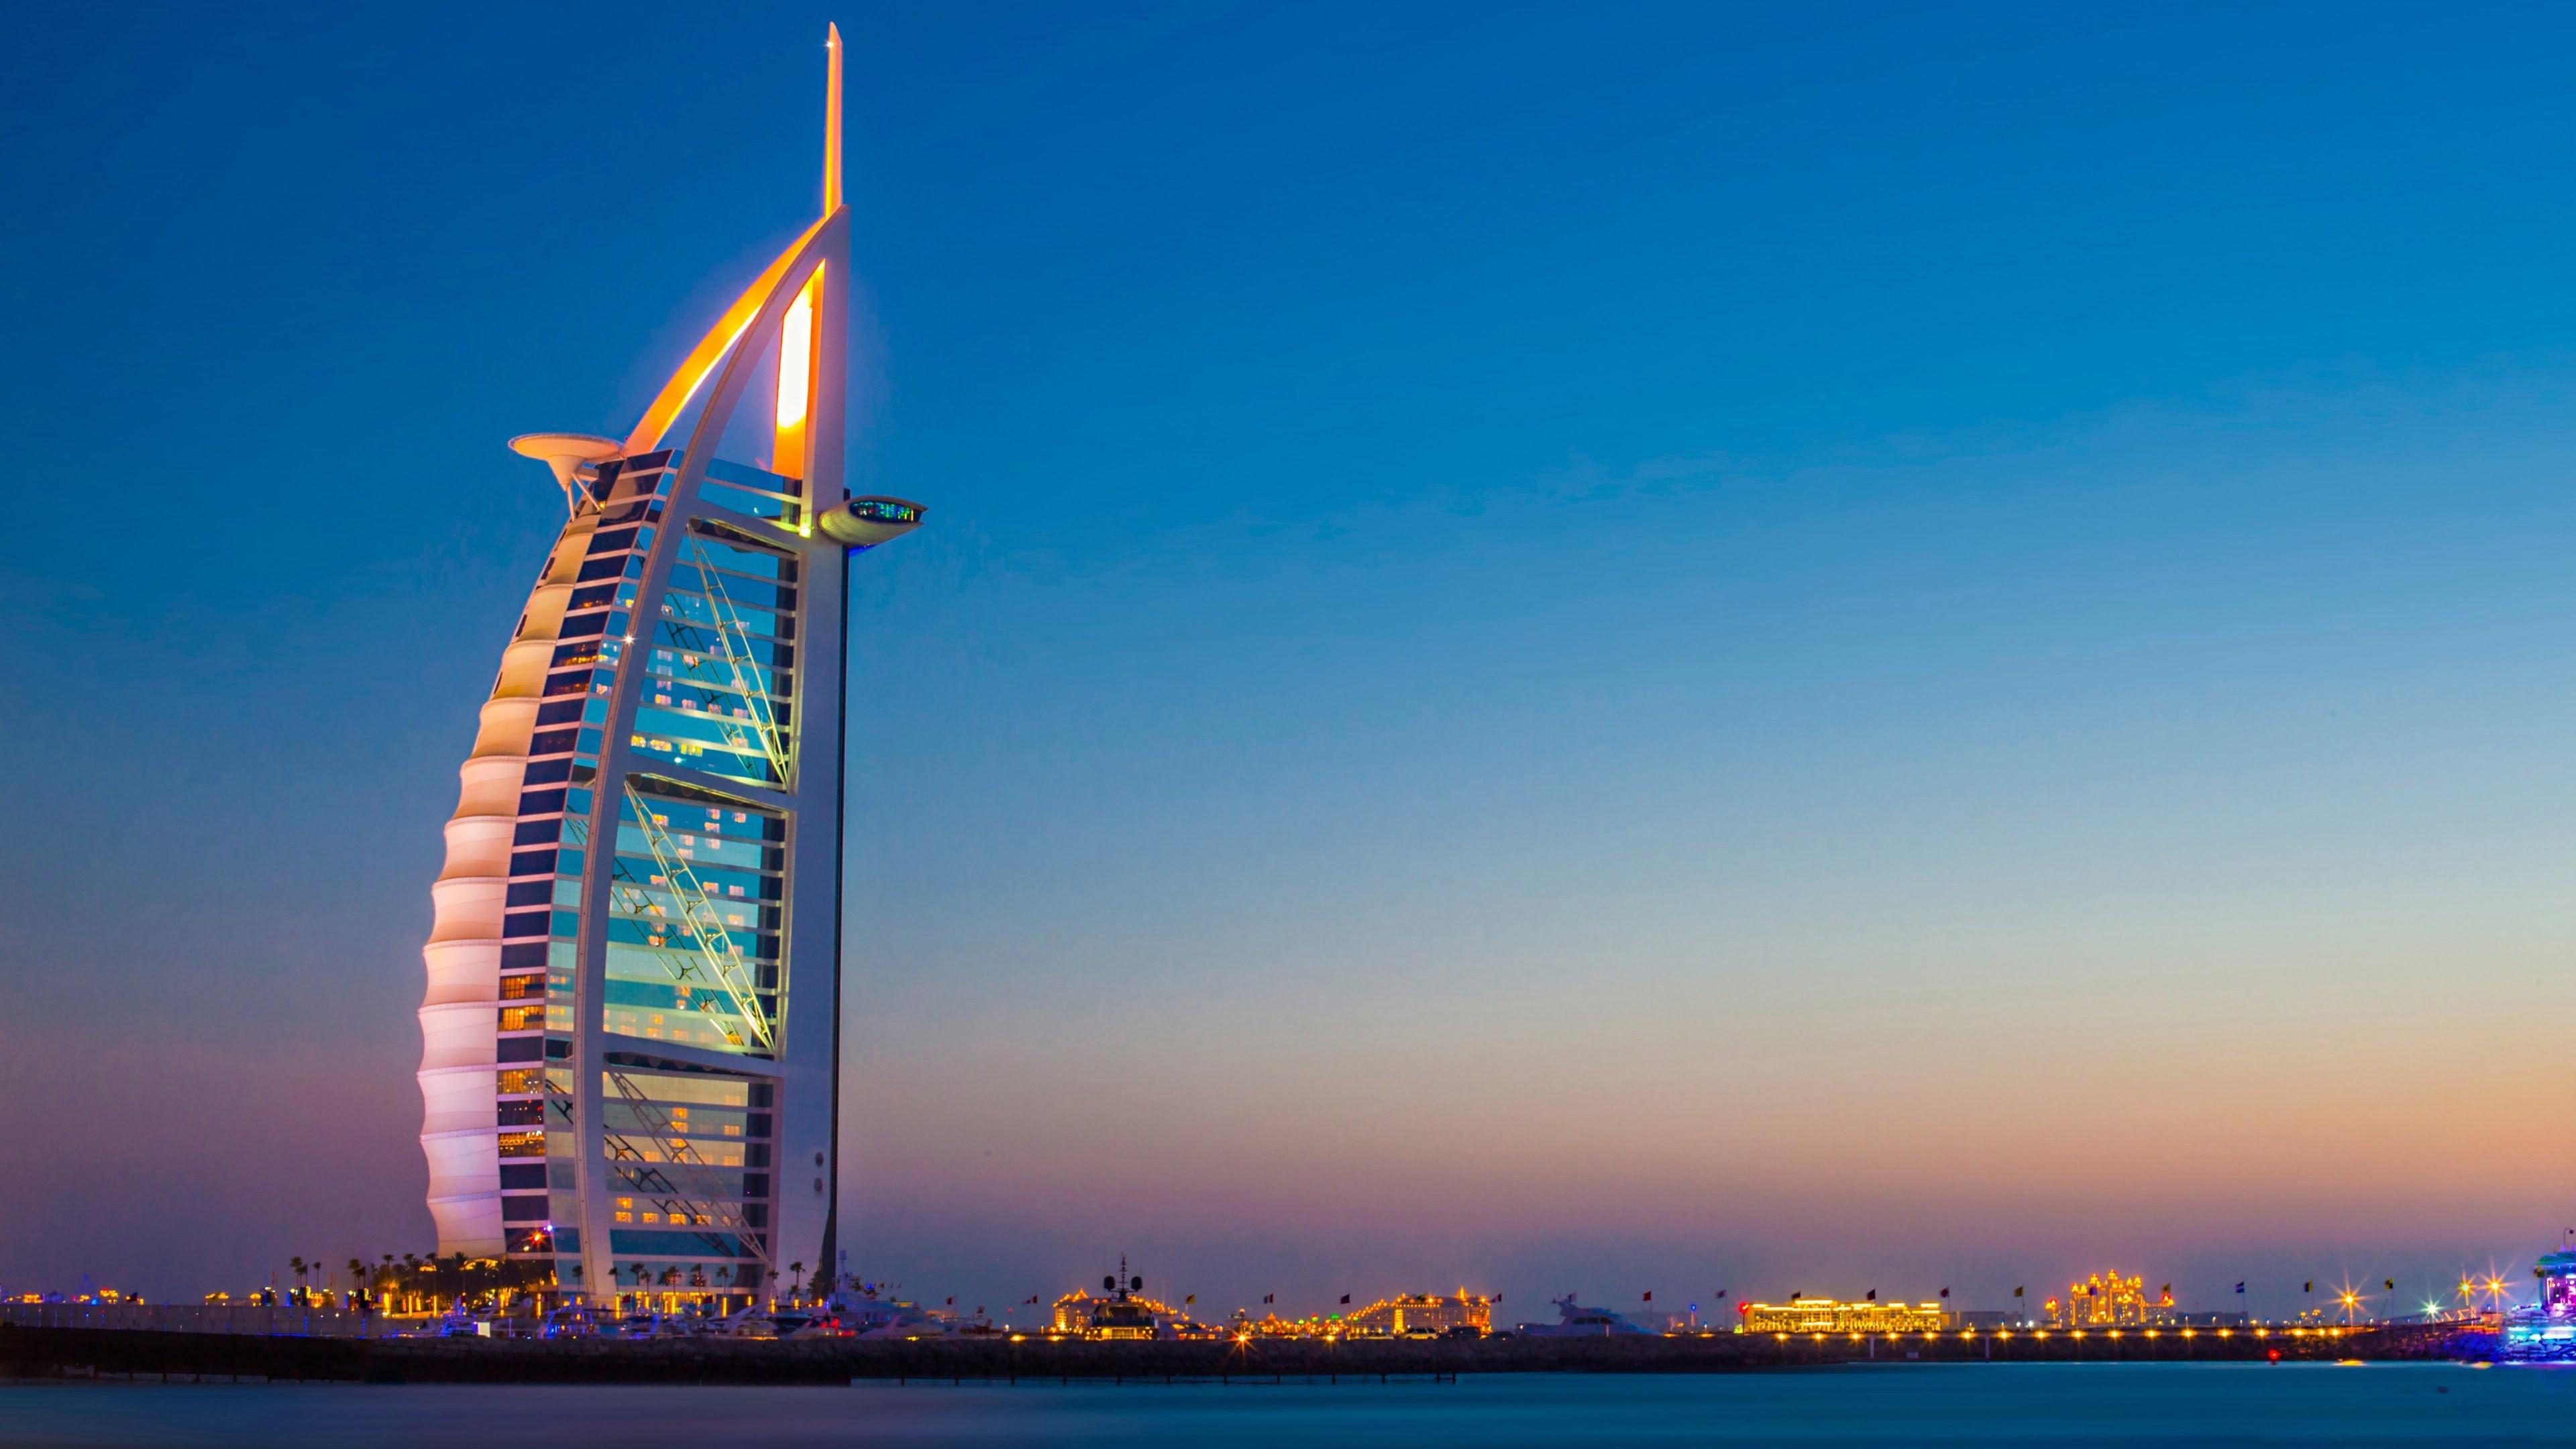 3840x2160_dubai-united-arab-emirates-uae-burj-al